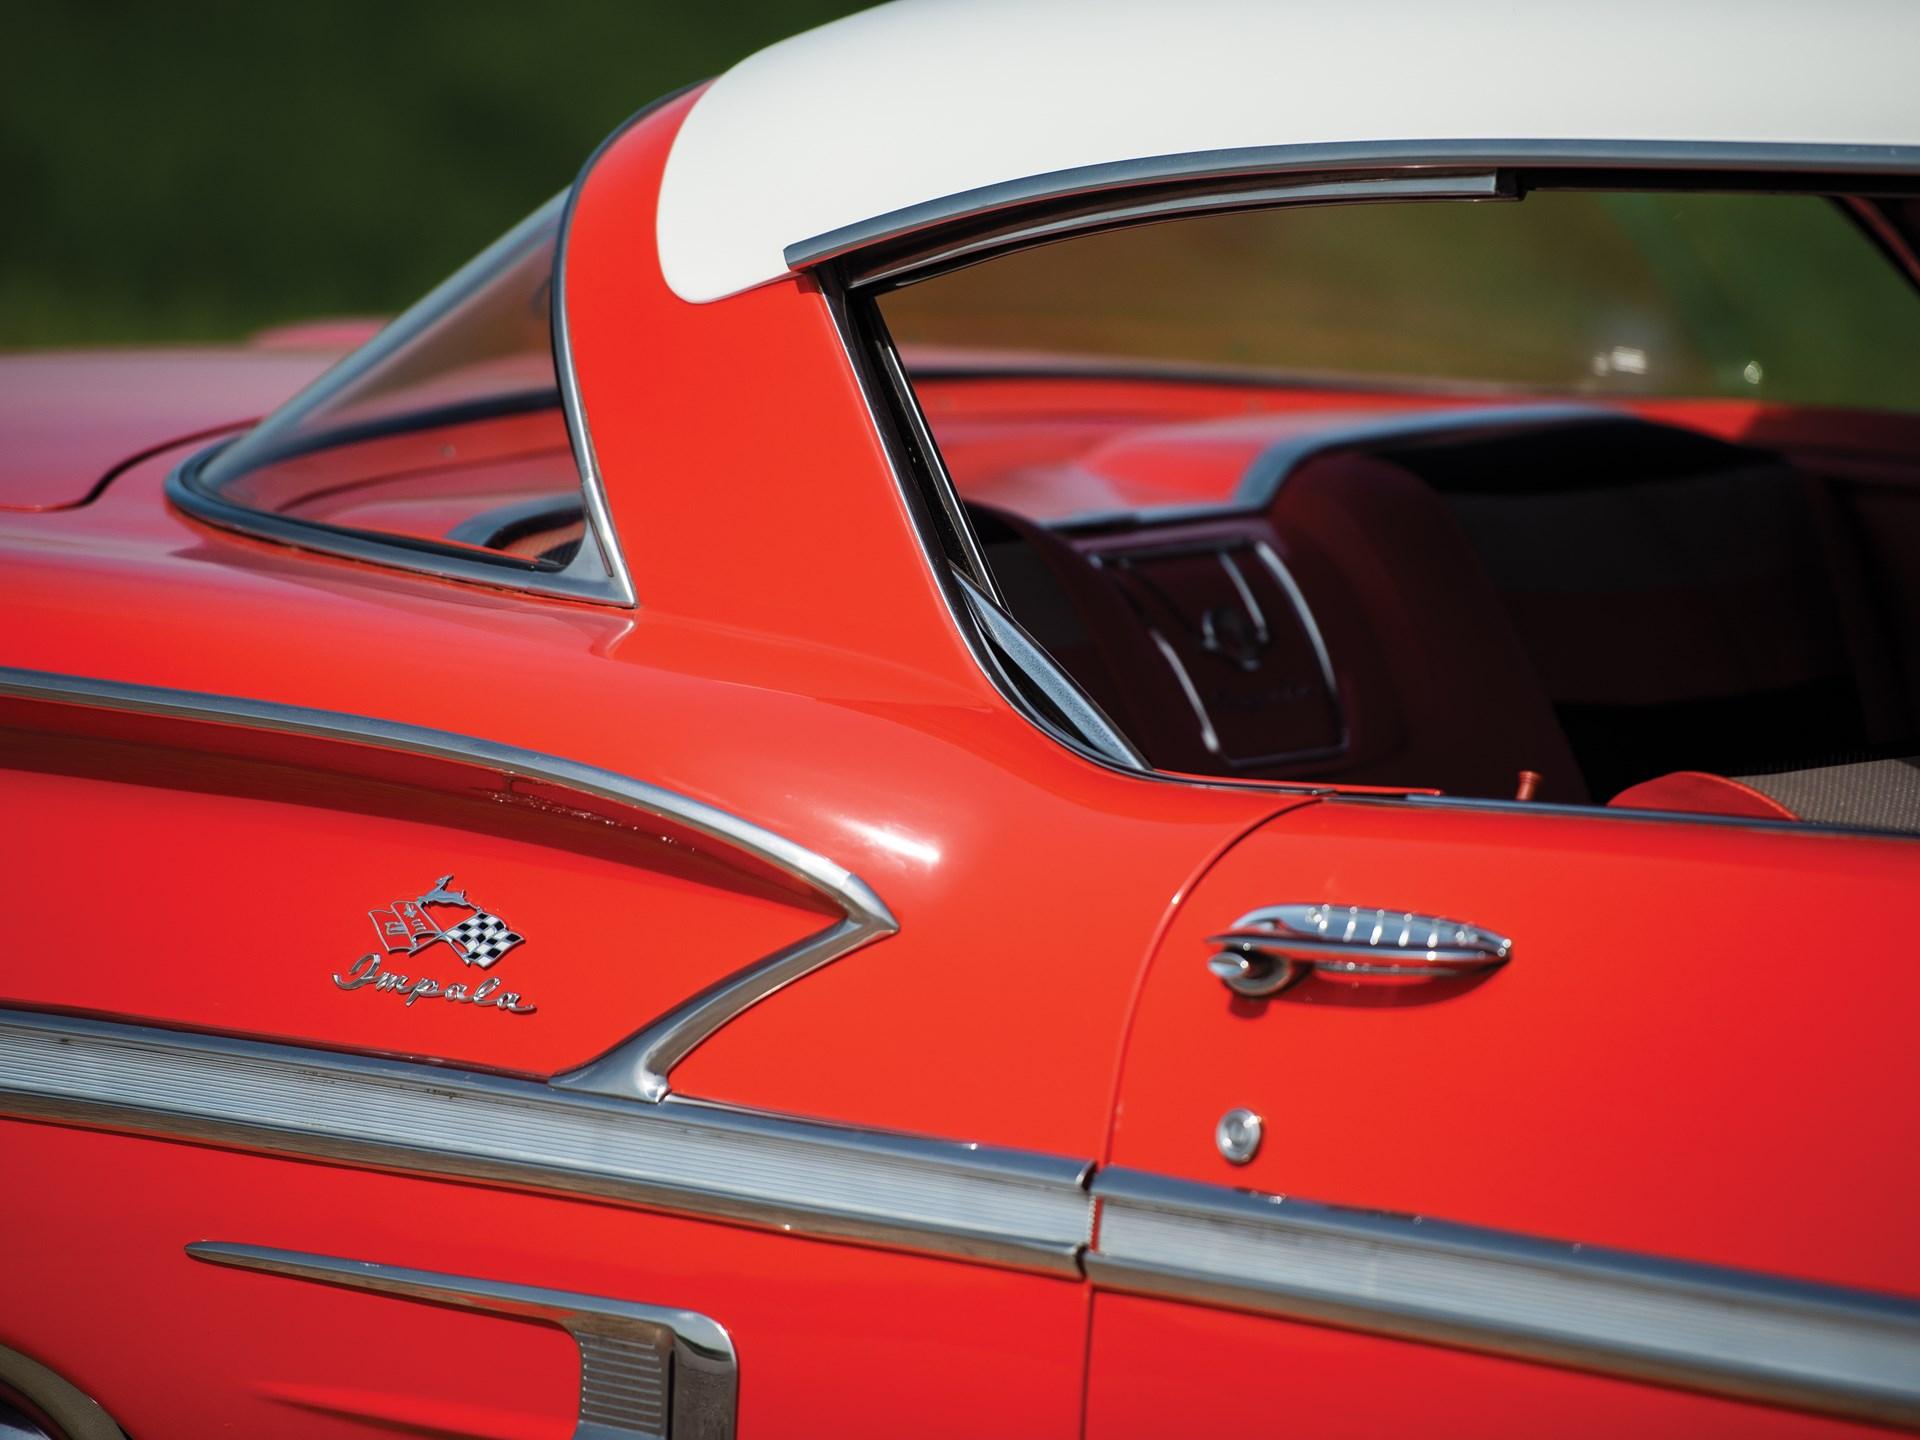 1958 Chevrolet Bel Air Impala Sport Coupe